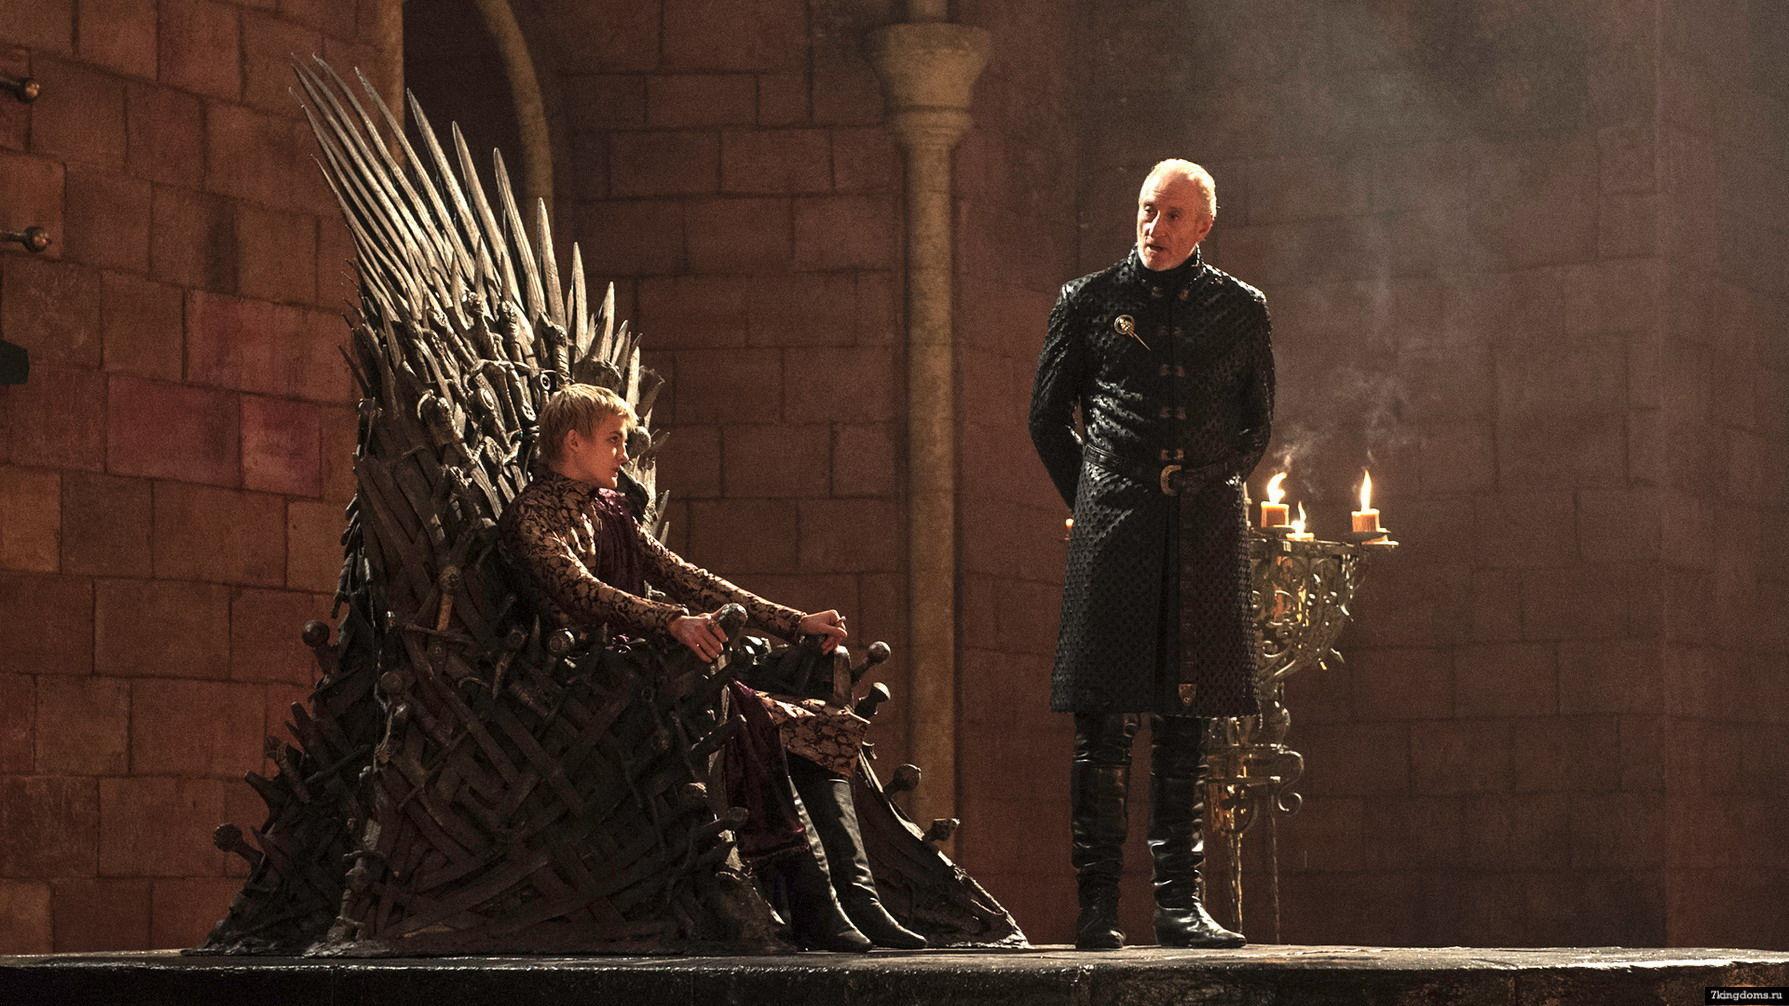 ¿Joffrey Baratheon o Tywin Lannister?